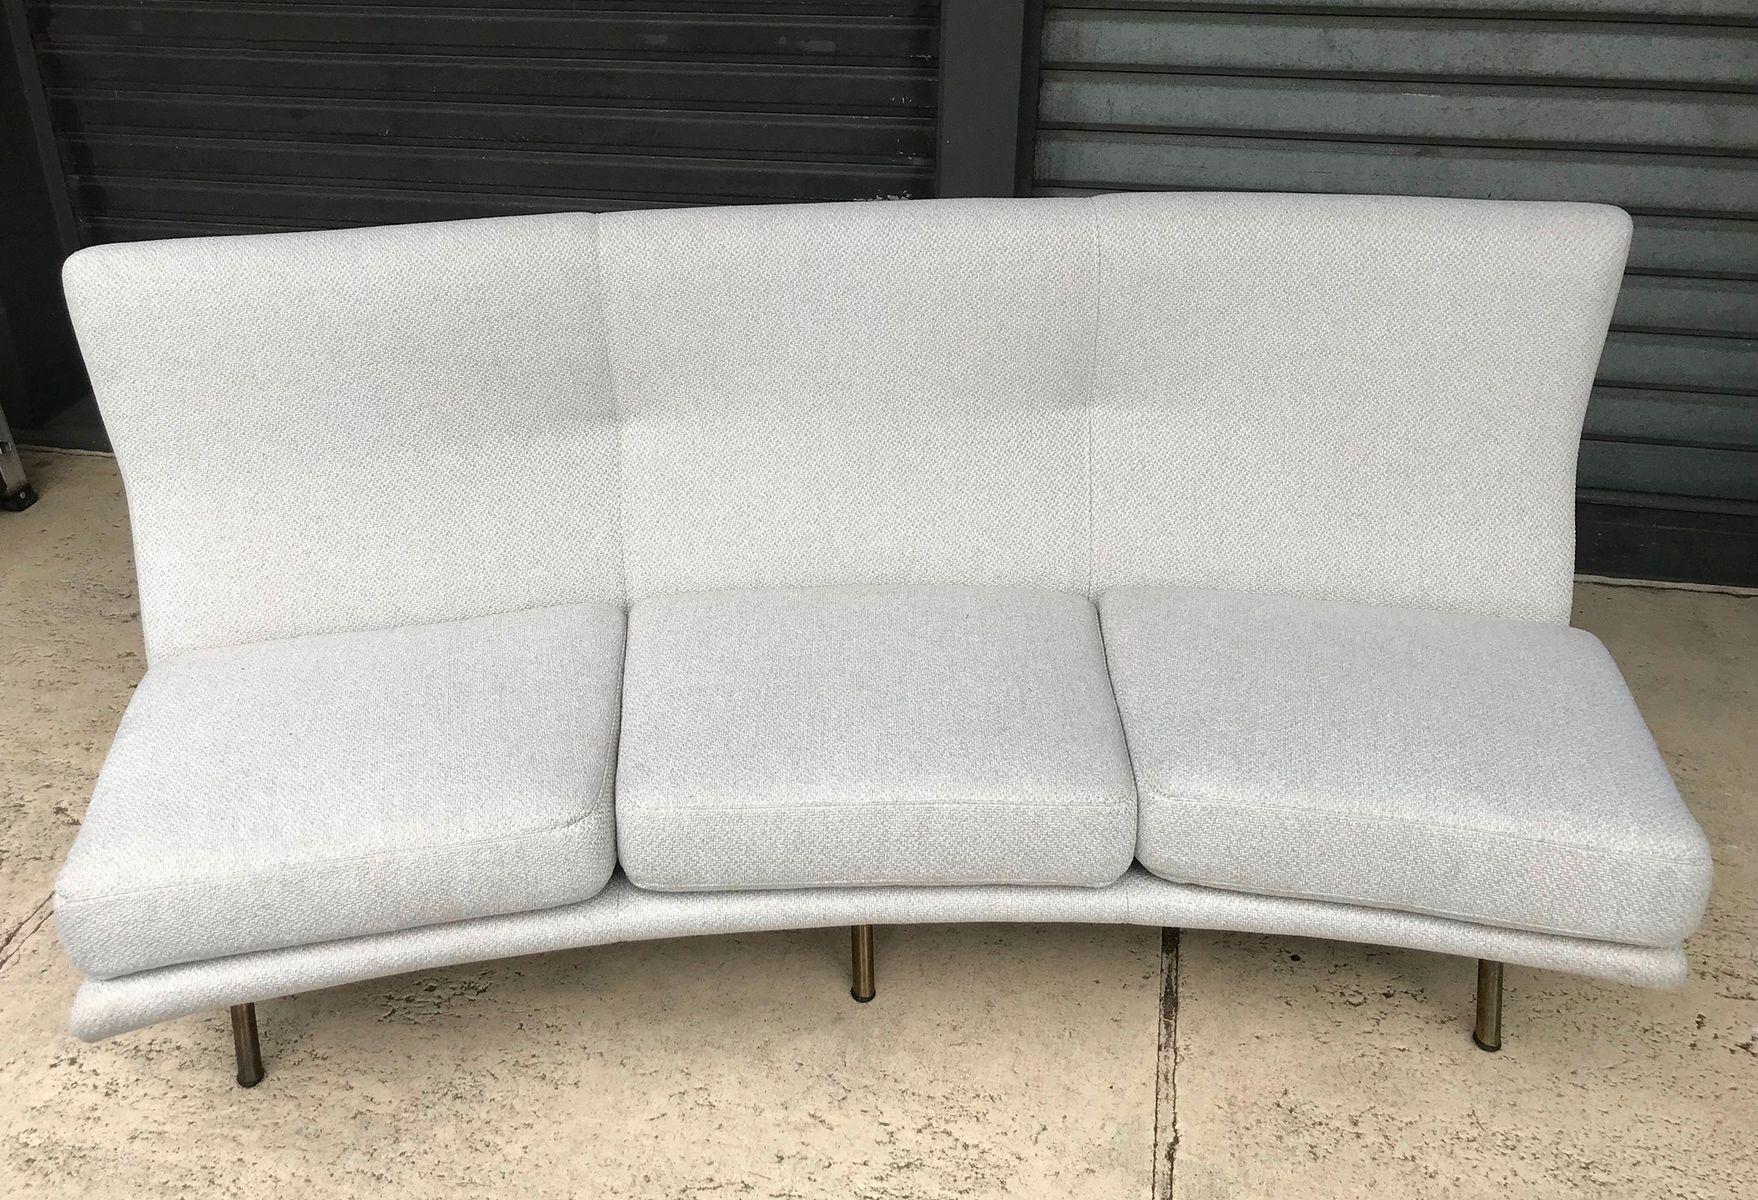 Italienische triennal sofa von marco zanuso f r artflex for Italienische sofa